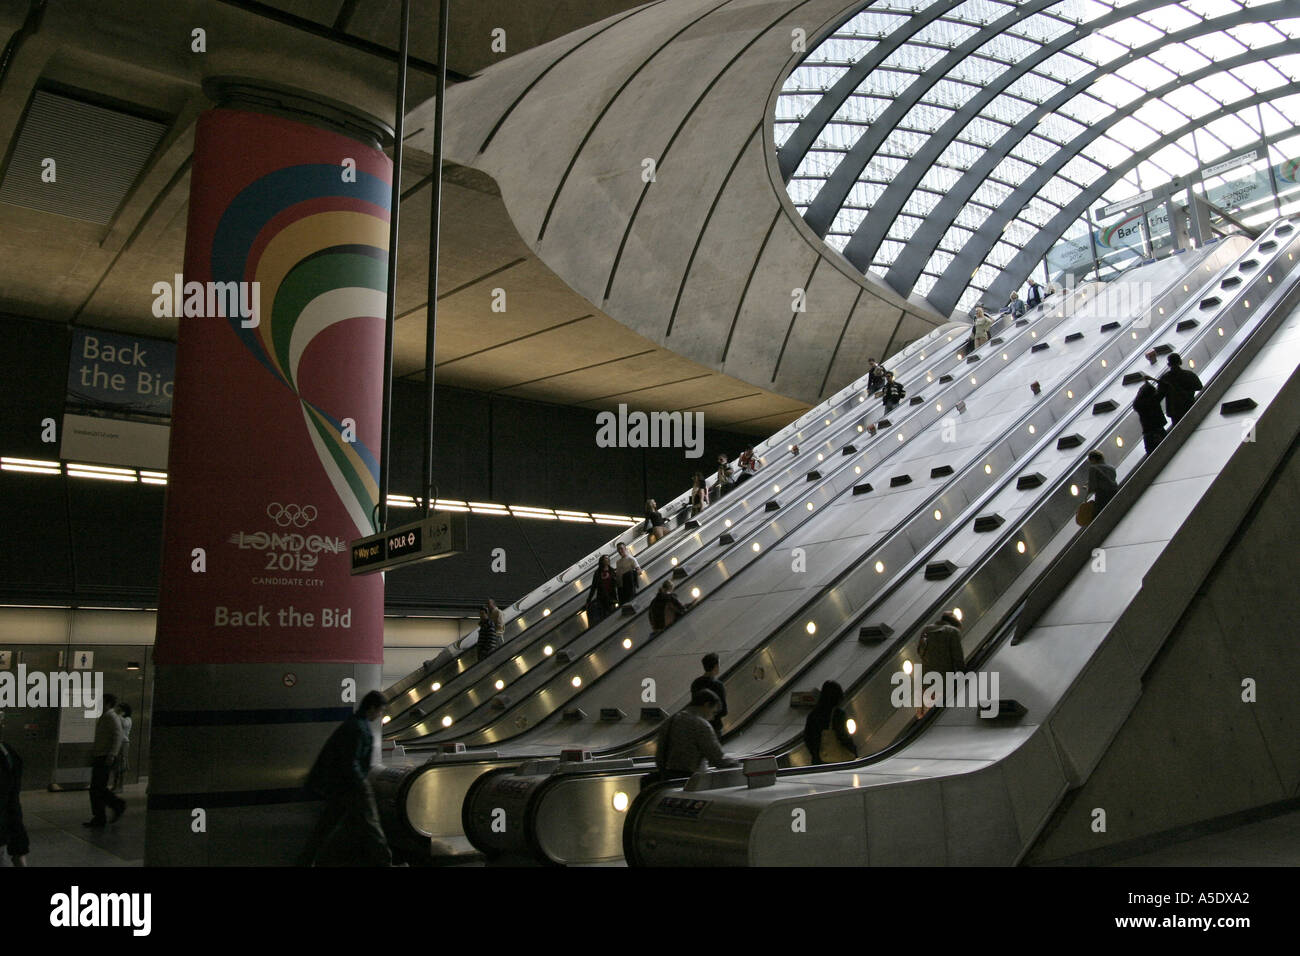 Canary Wharf tube underground station escalators in Docklands London England Stock Photo